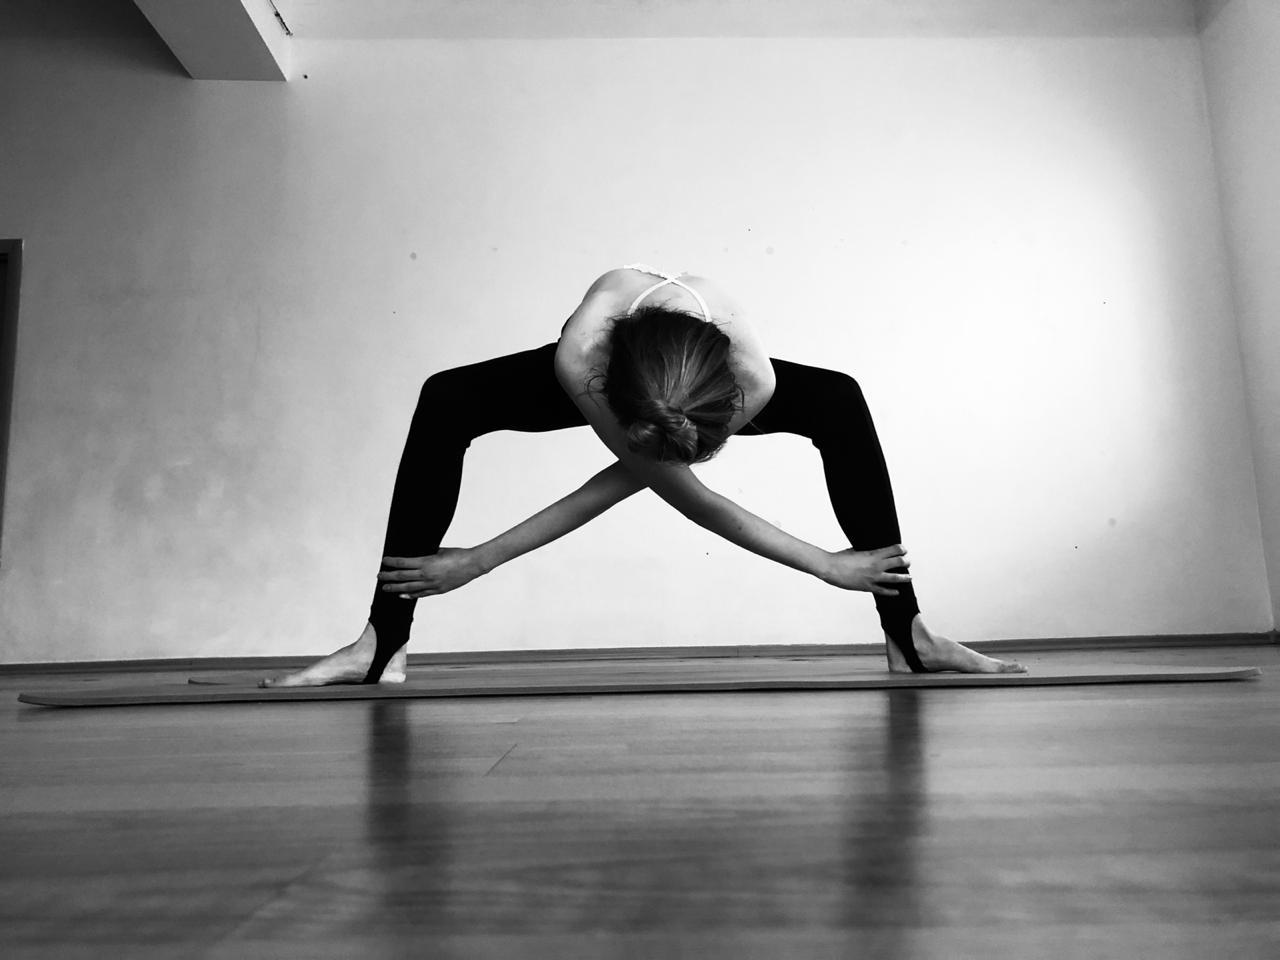 Йога от головной боли: эти 5 асан помогут .